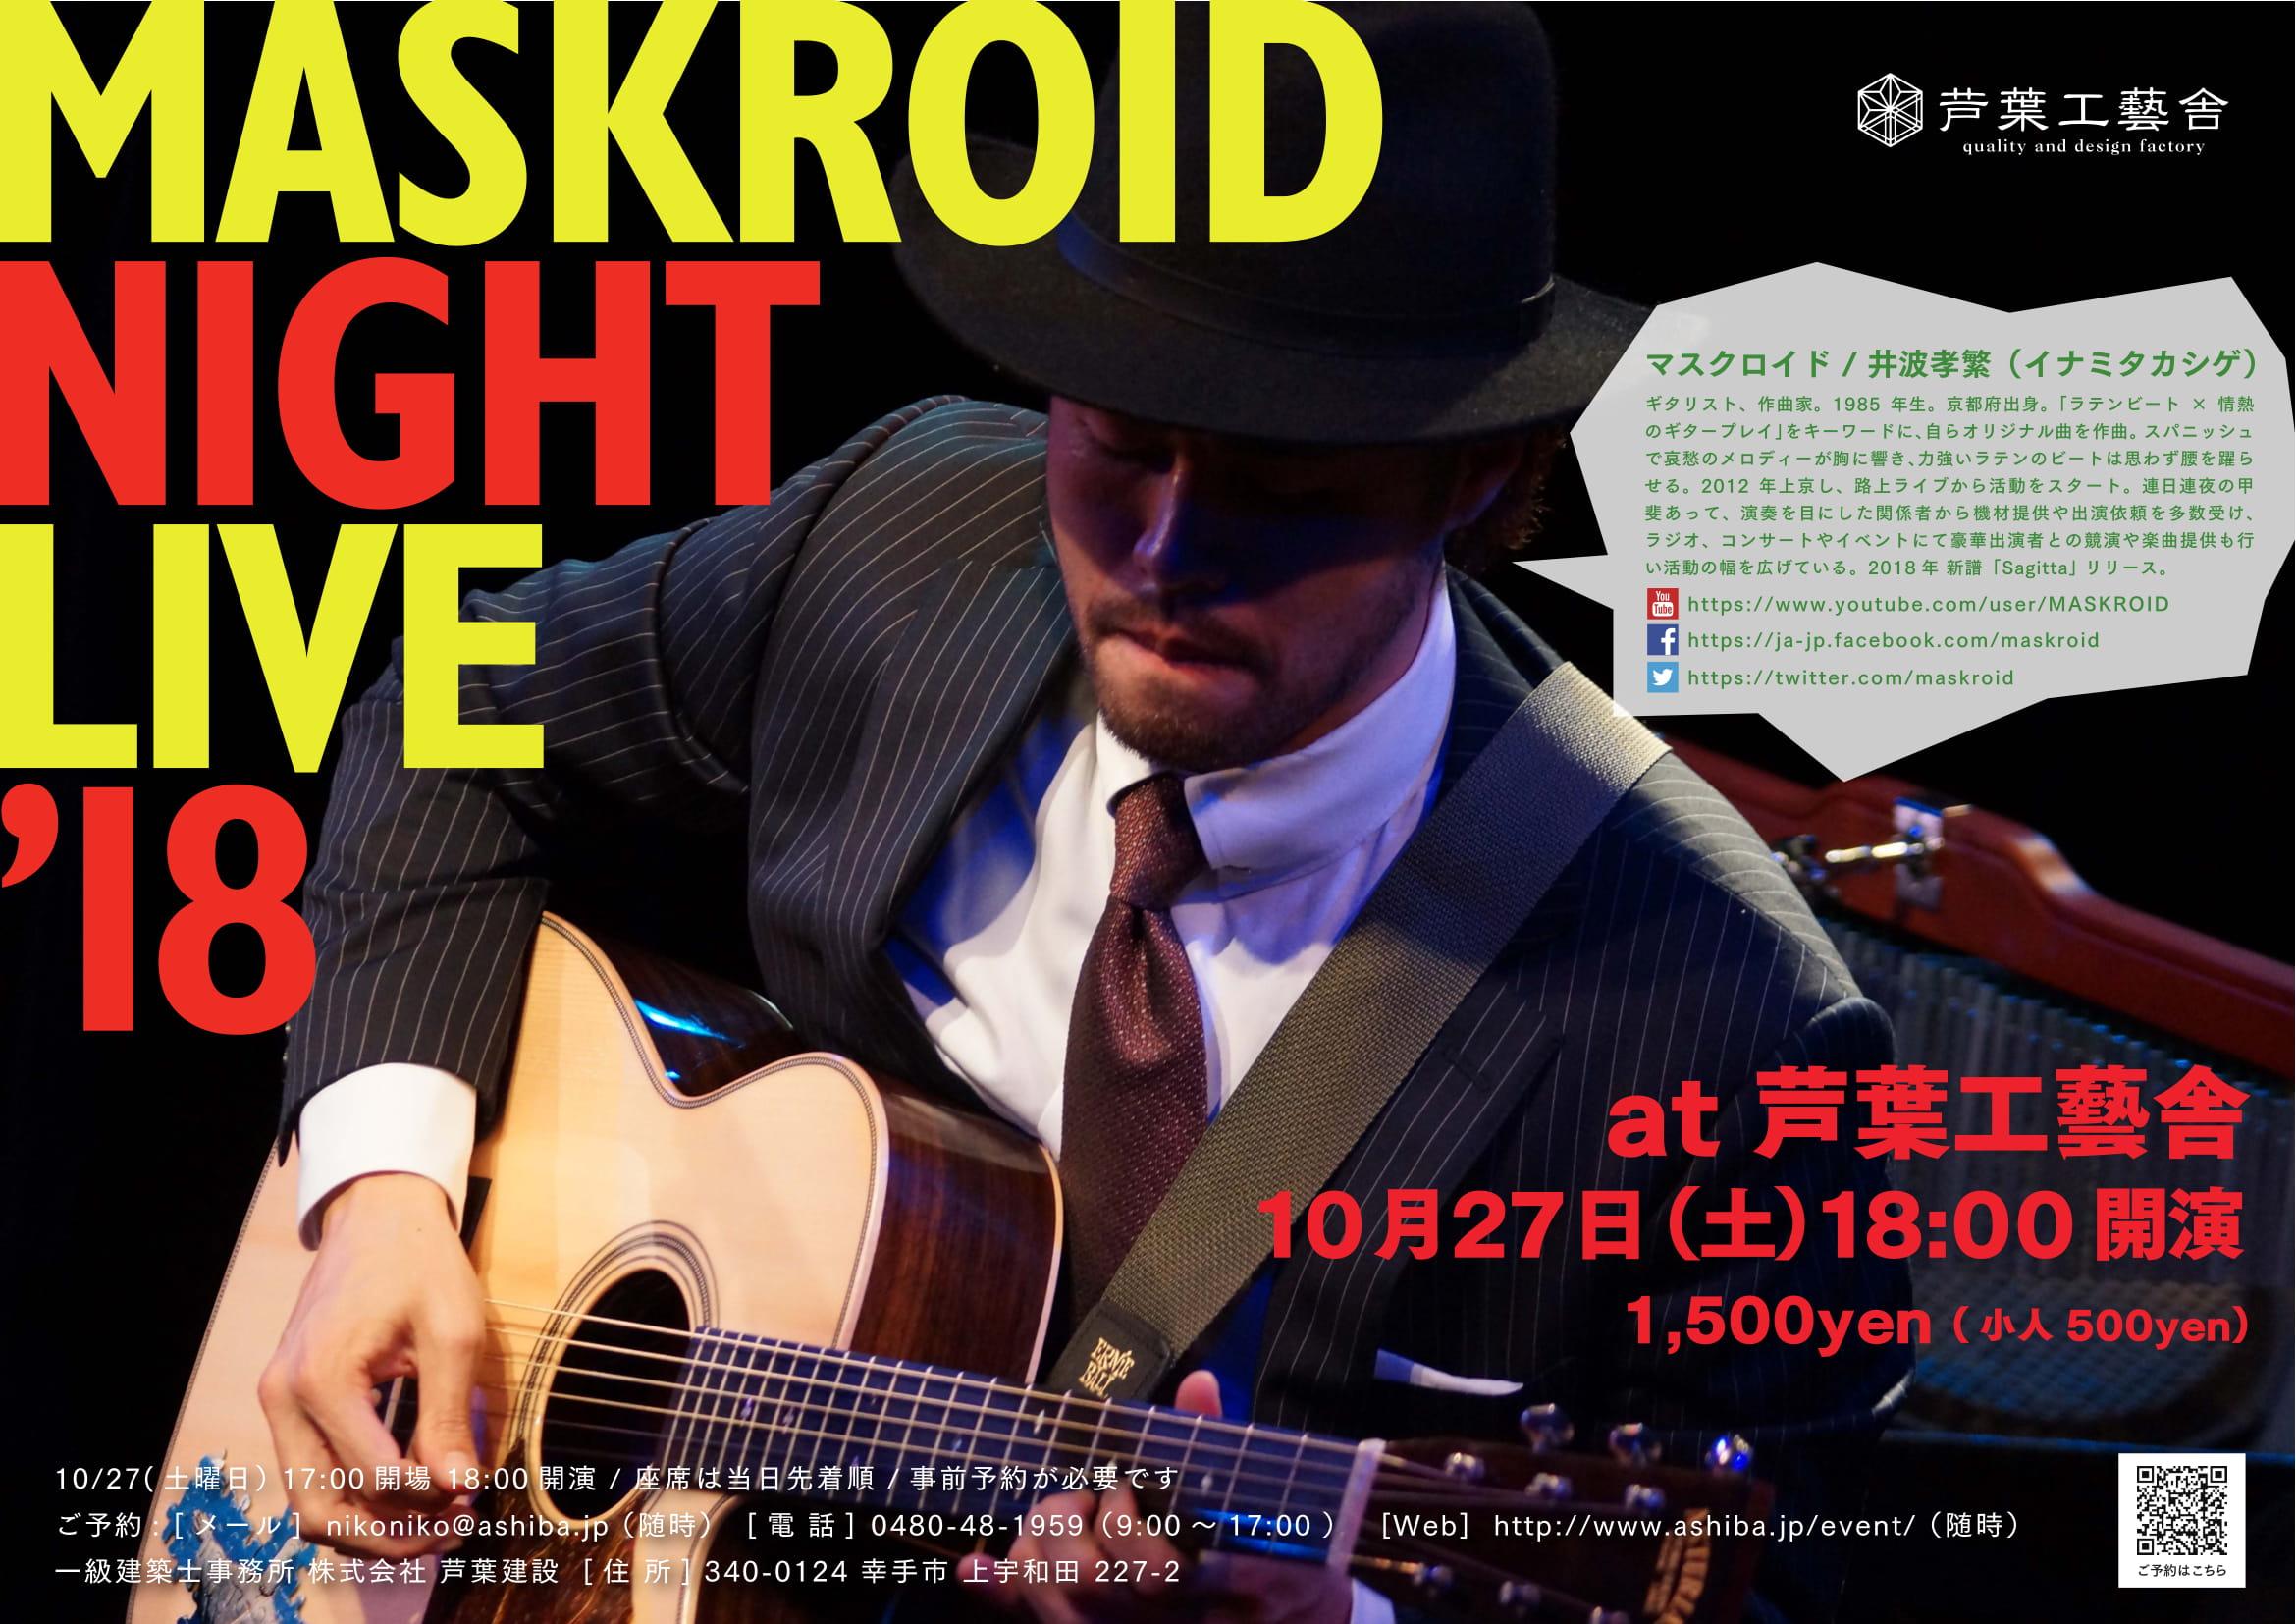 NIGHT LIVE2019@芦葉工藝舎